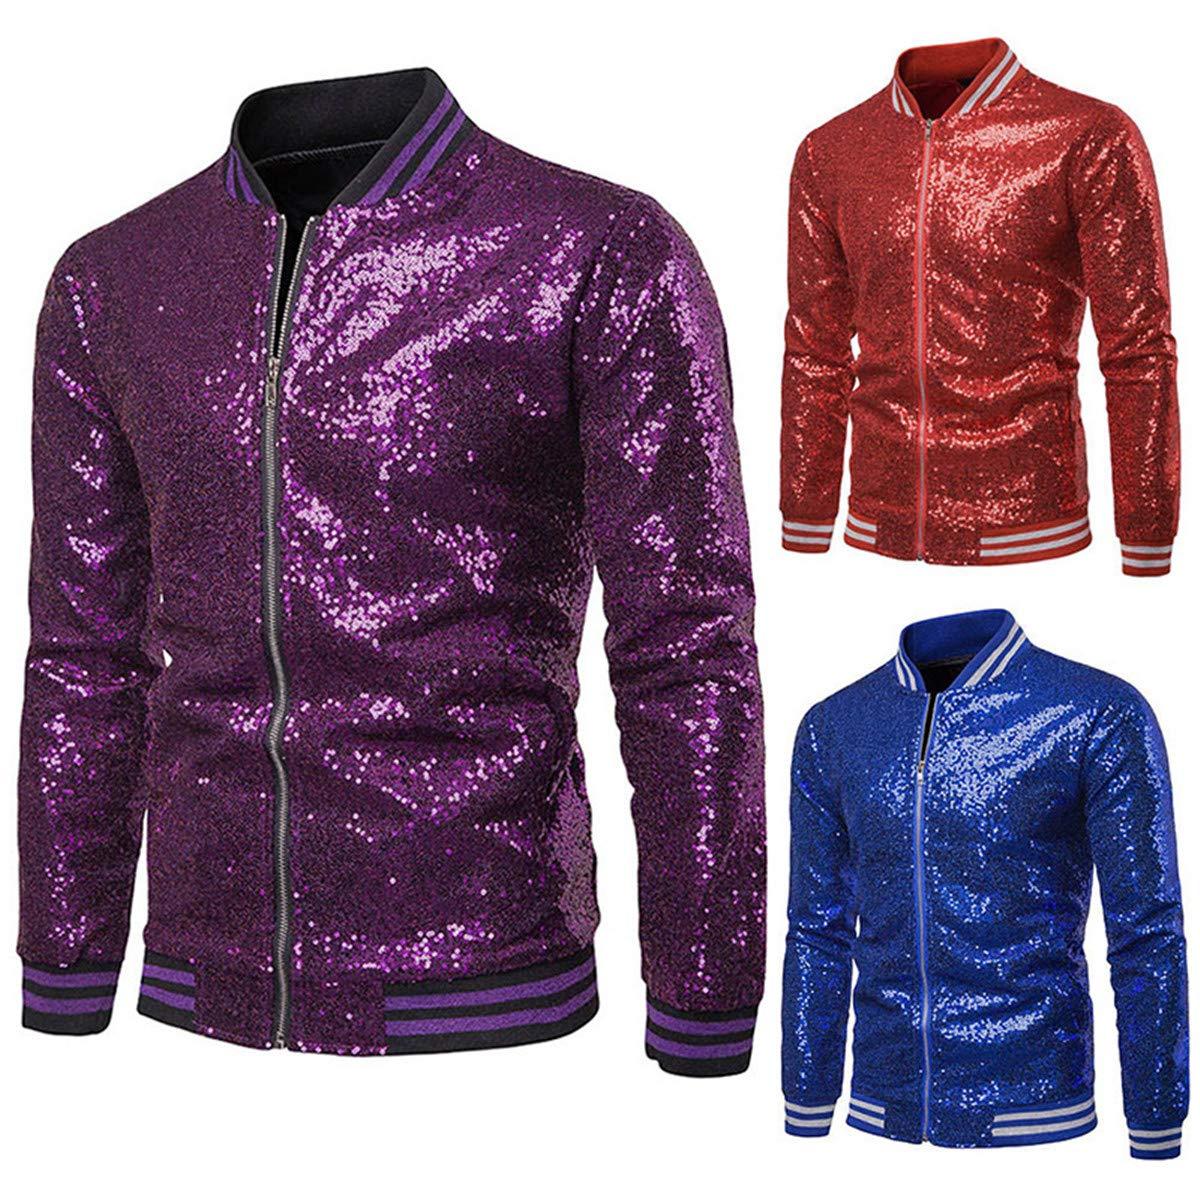 Mens Slim Fit Metallic Jacket,Long Sleeve Sparkle Sequin Shiny Zip Up Nightclub Varsity Bomber Party Jacket